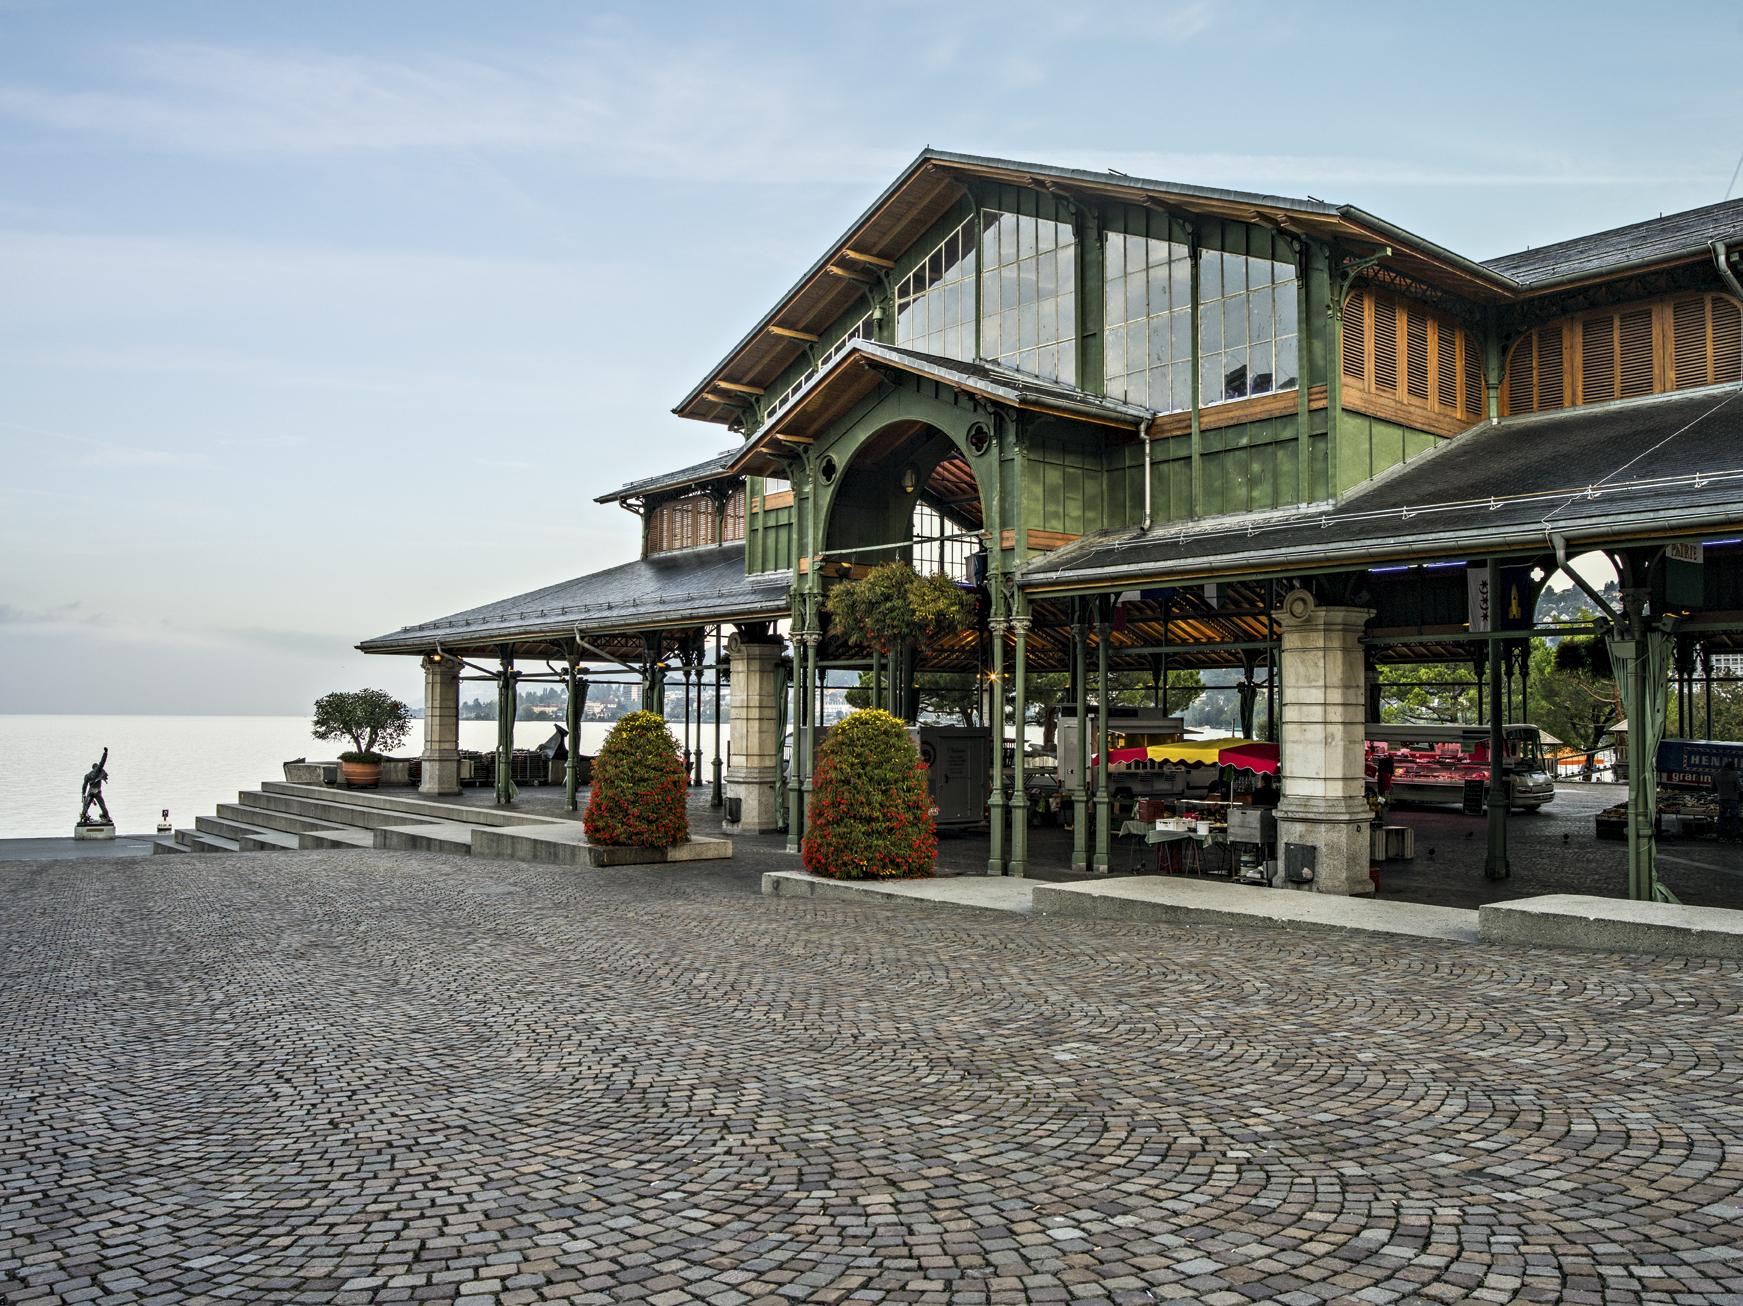 Marché couvert montreux riviera seminarhotels schweiz tourismus